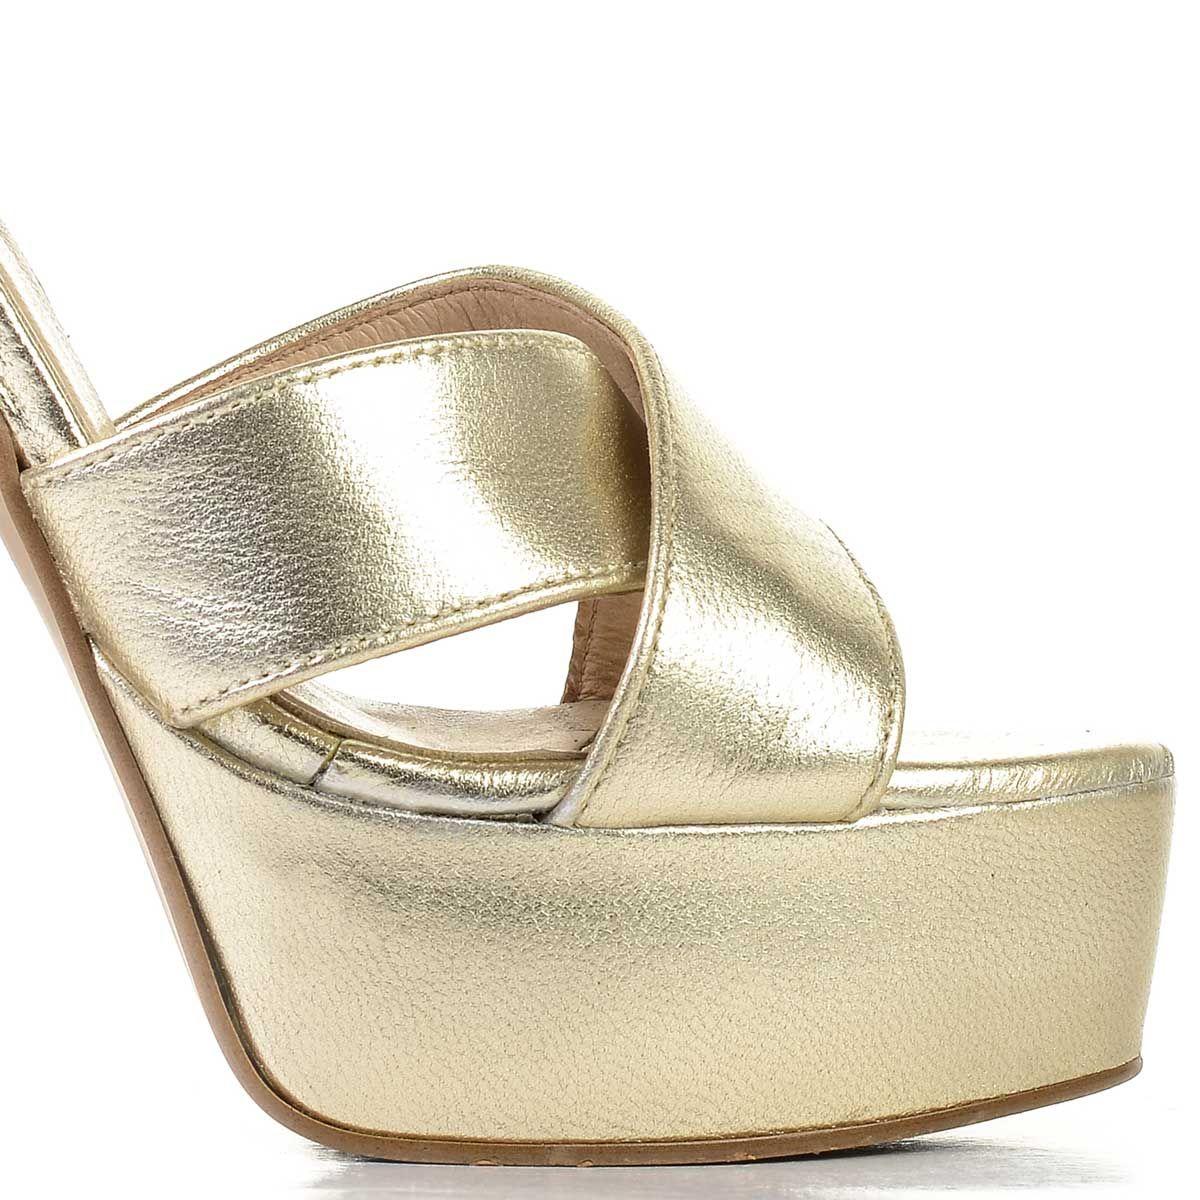 Montevita Platform Sandal in Gold